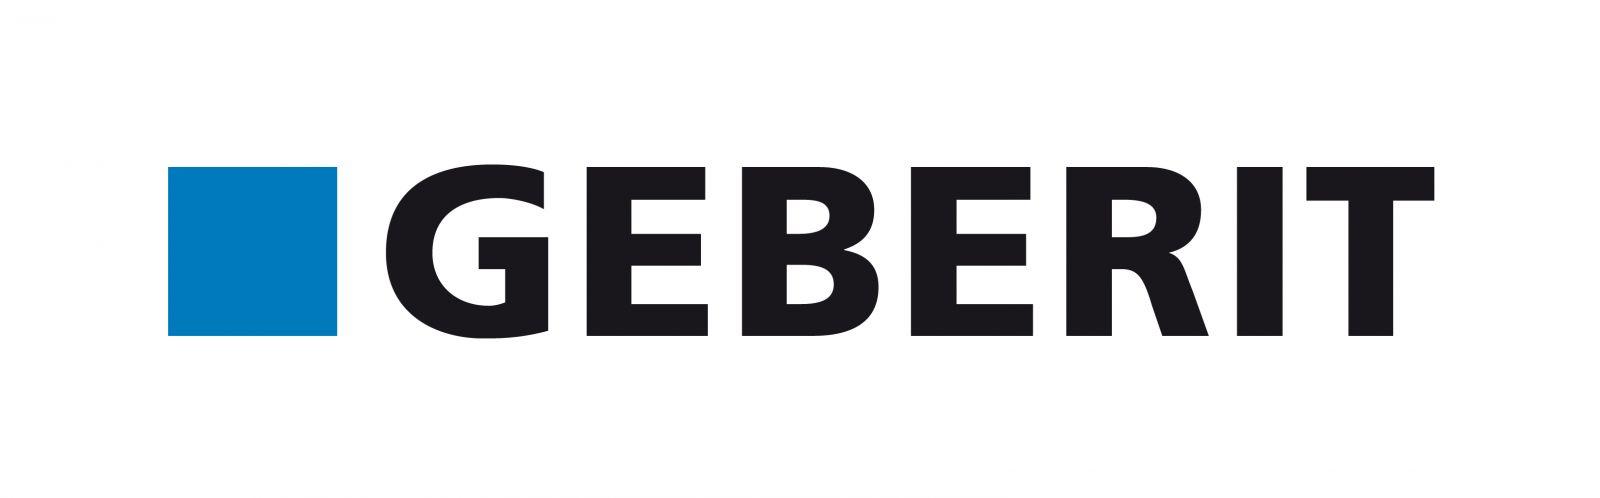 geberit logo.jpg